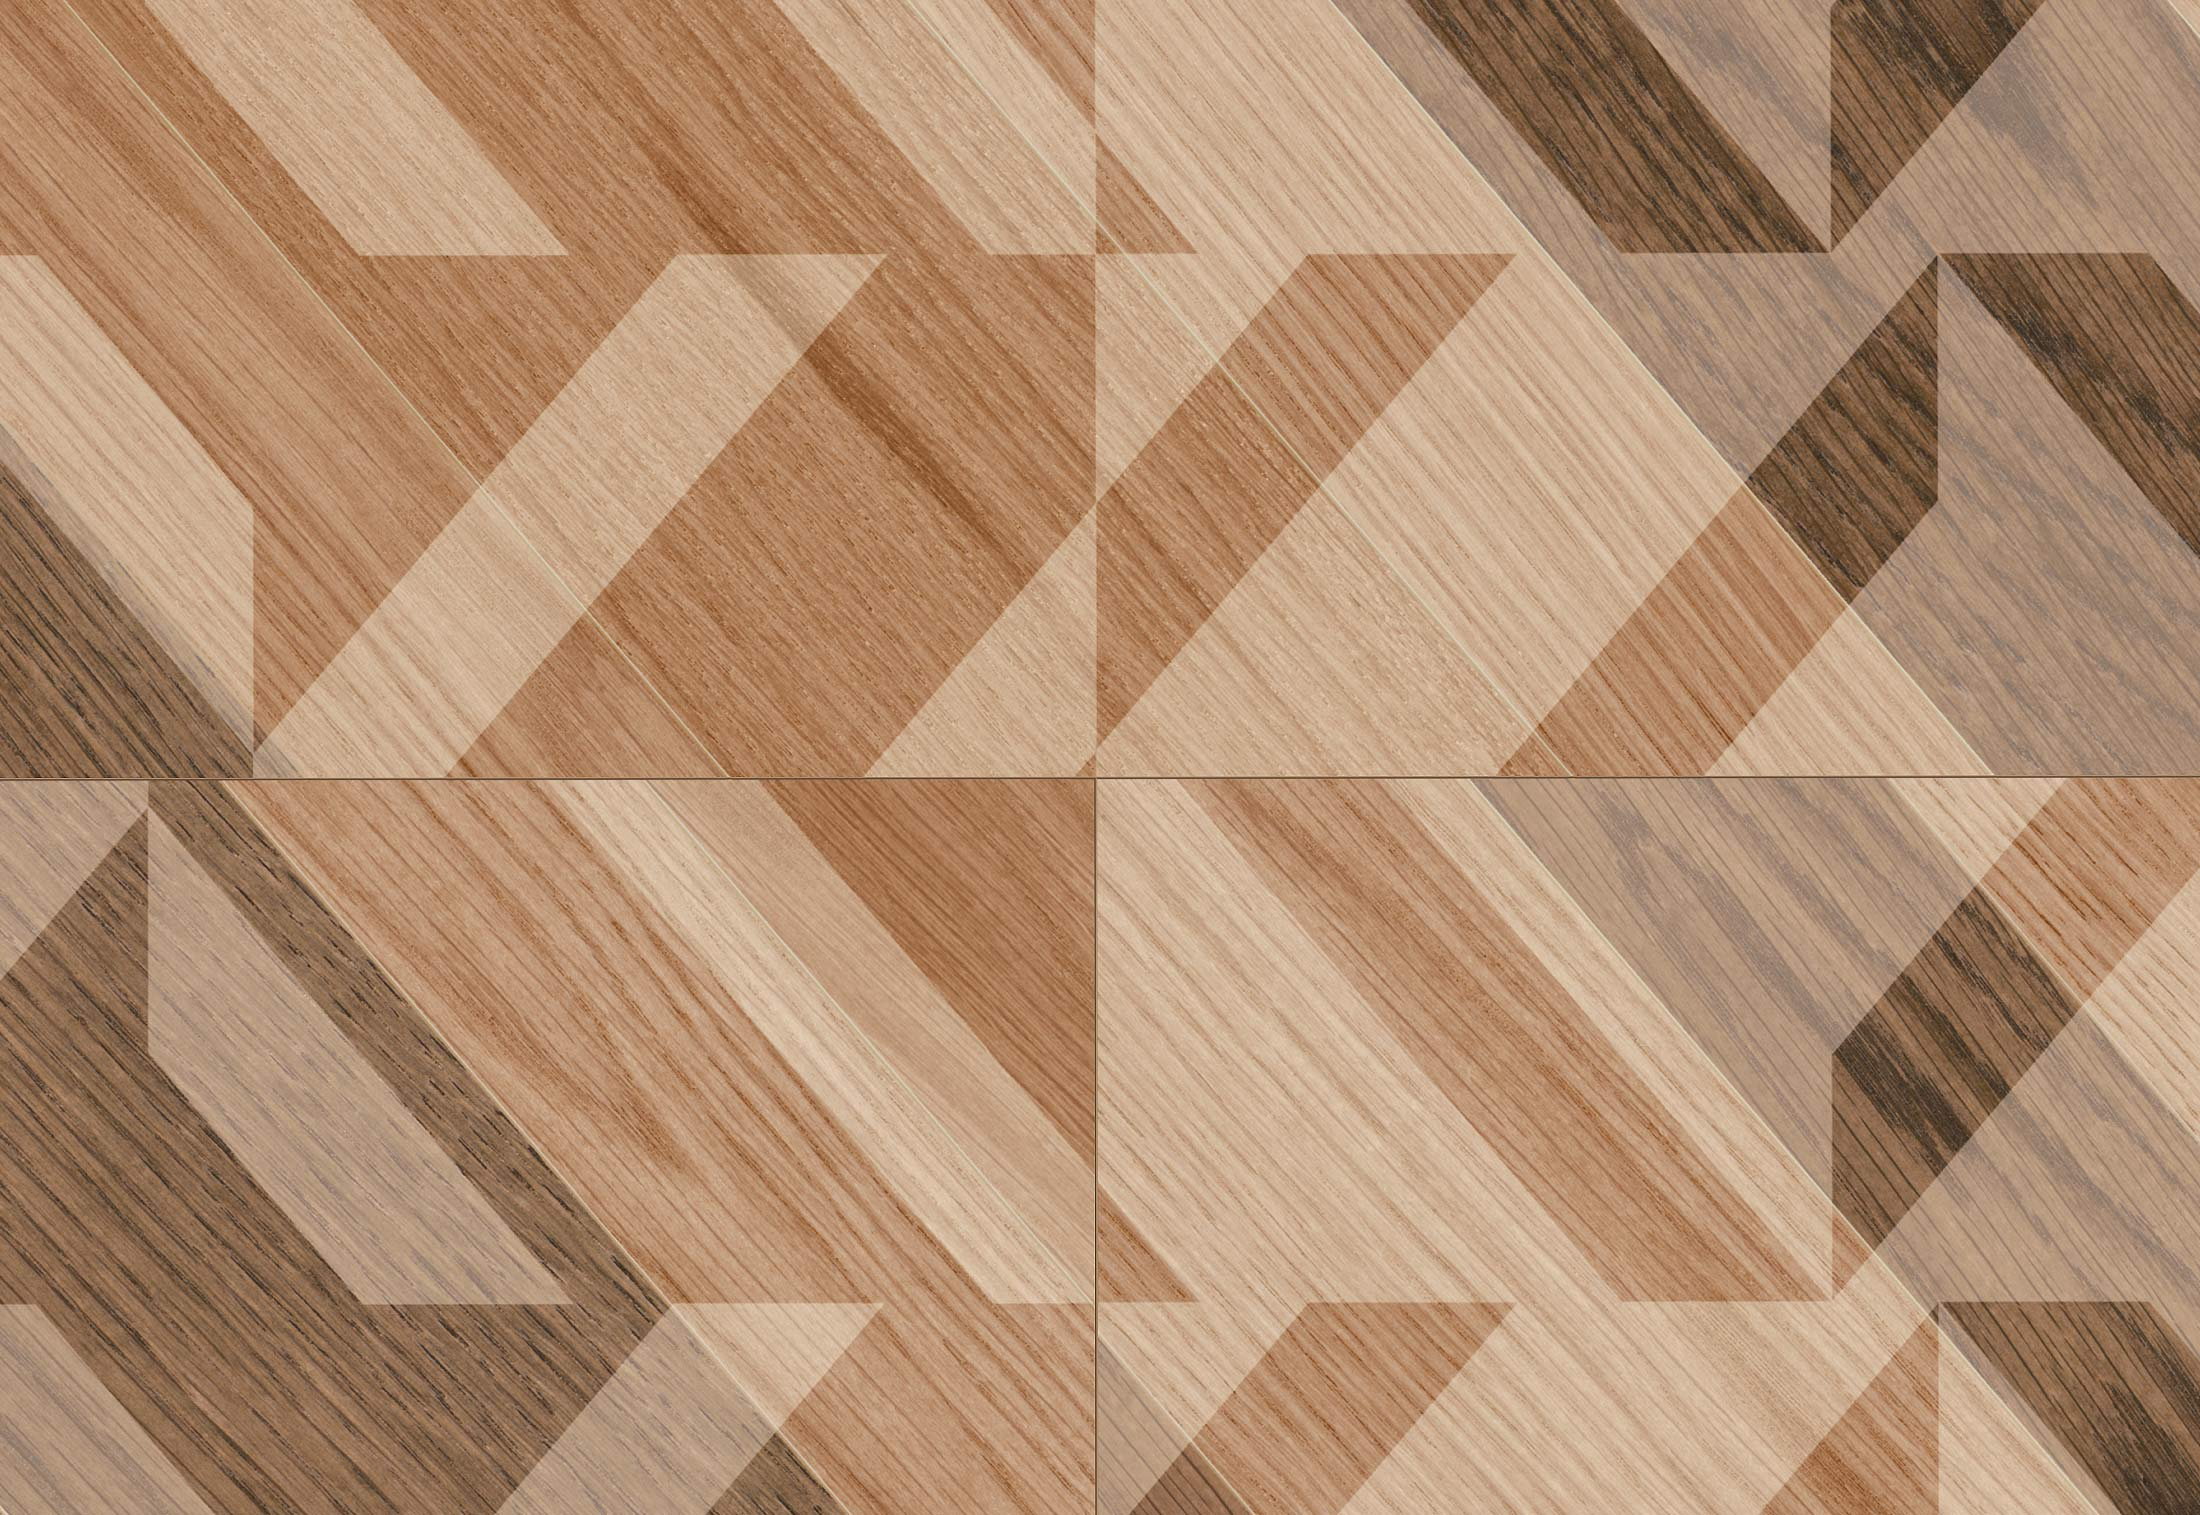 Laminat new classic design edition ornamental oak by for Design laminat